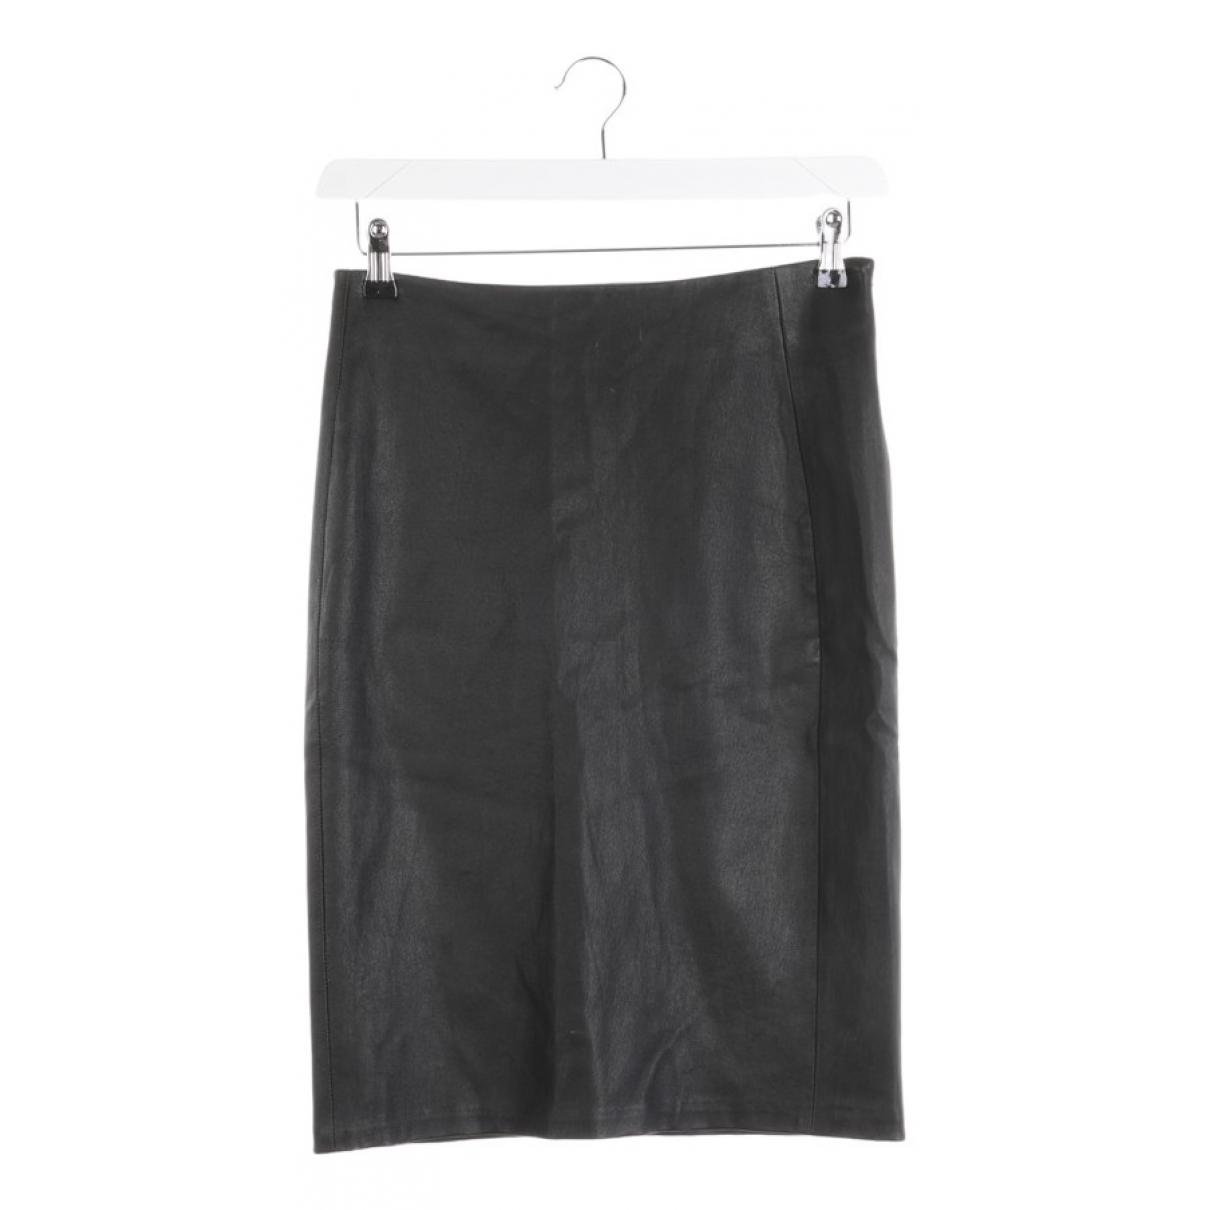 Diane Von Furstenberg \N Black Leather skirt for Women 34 FR